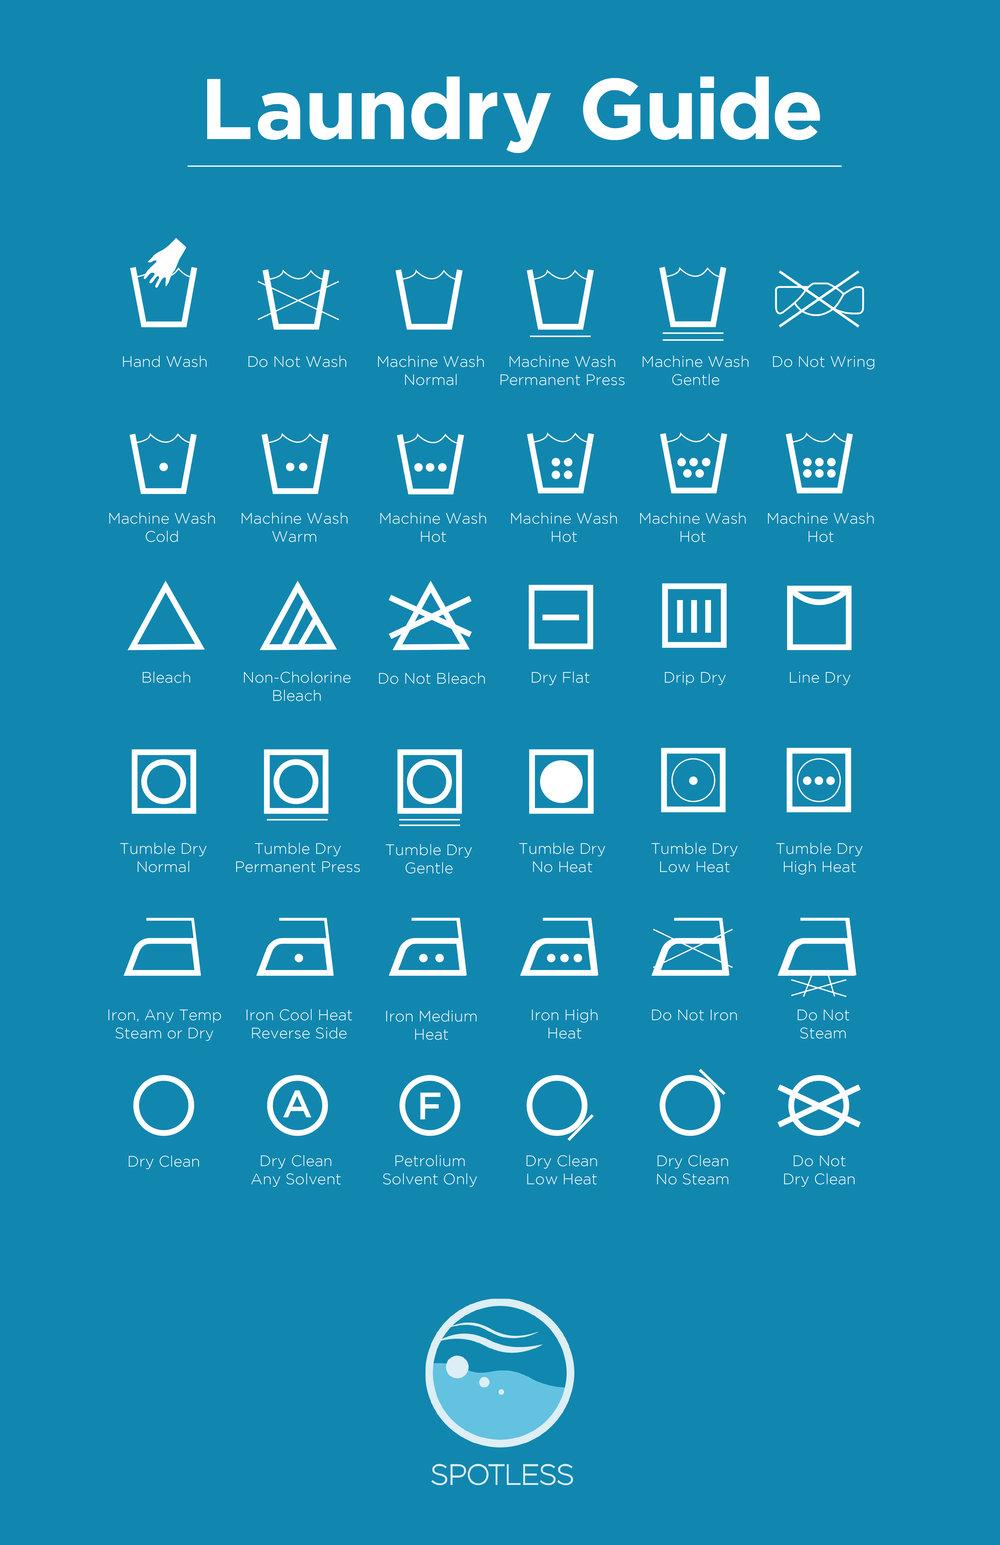 Laundry_information_poster.jpg